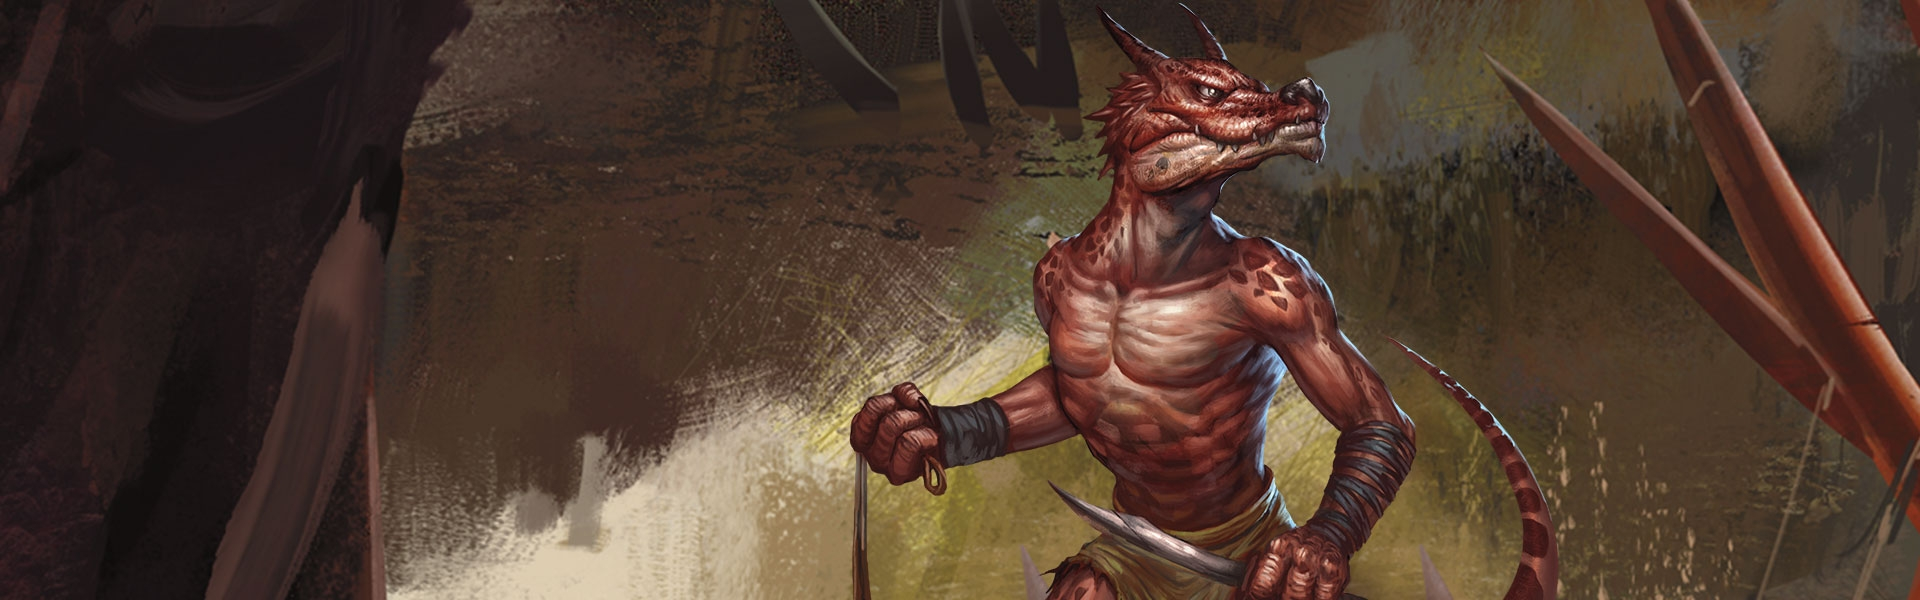 Monsters -- Kobold